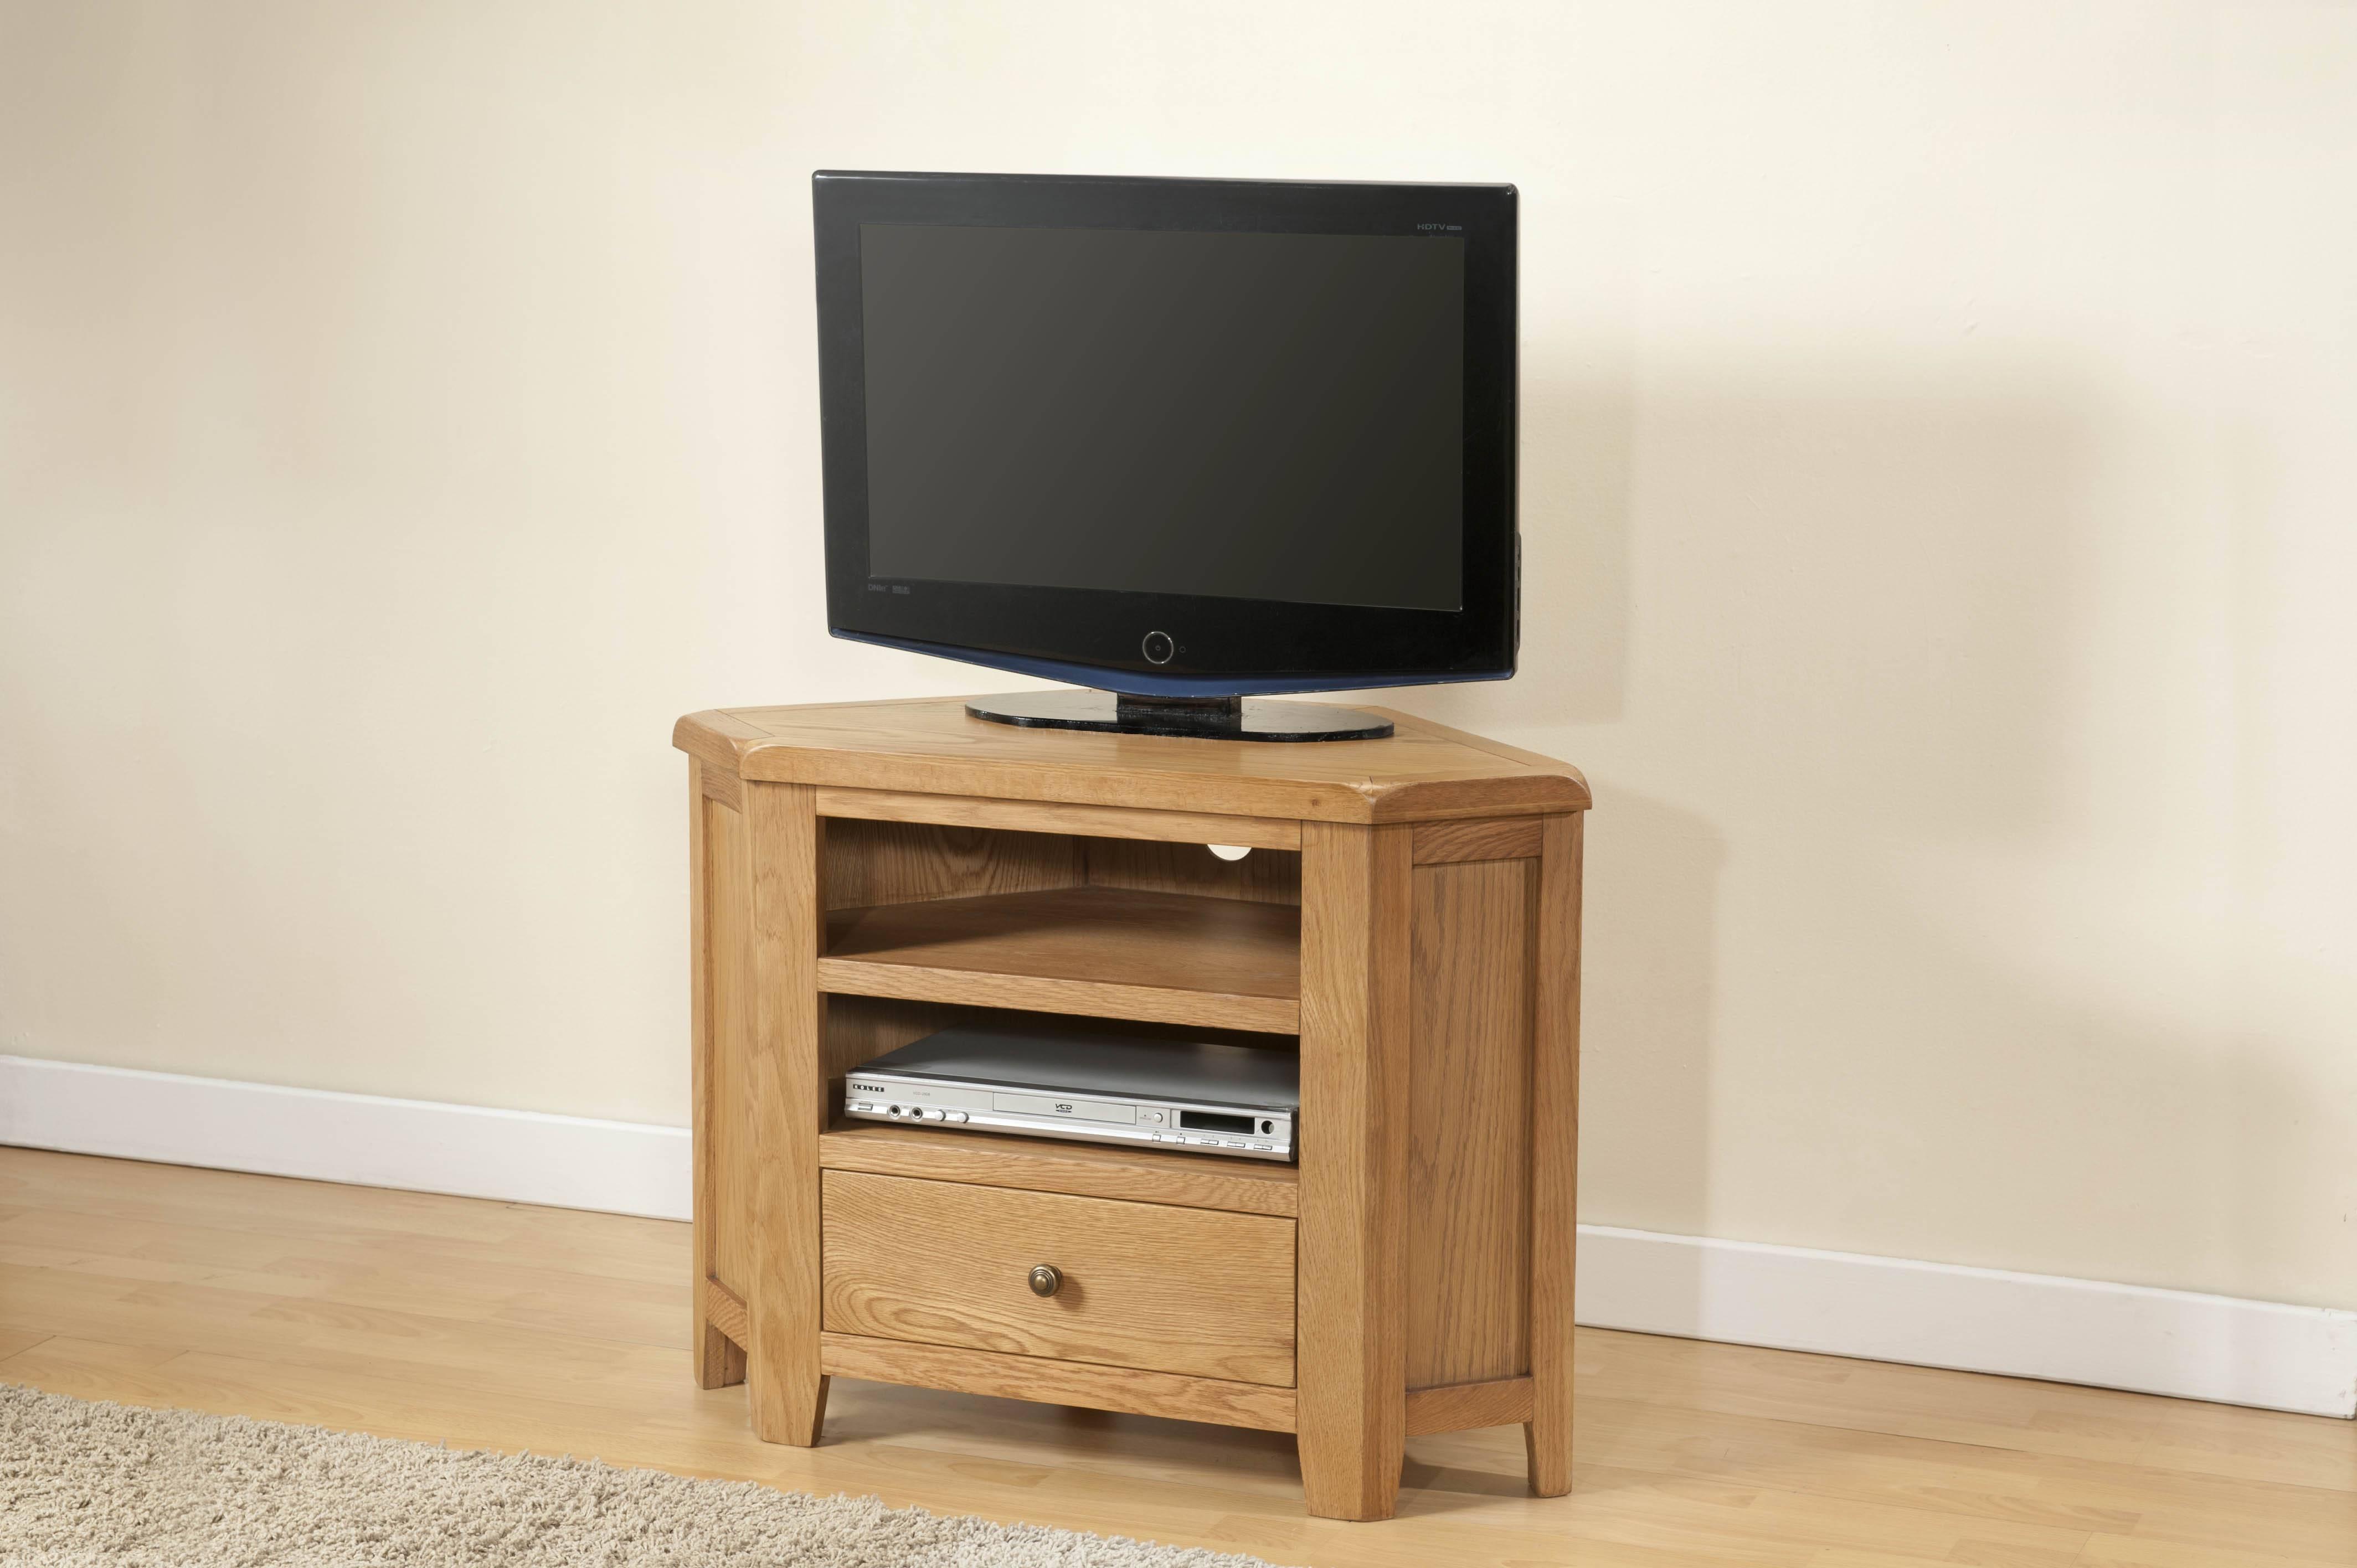 Shrewsbury Oak Corner Tv Unit | Oak Furniture Solutions Inside Corner Oak Tv Stands (View 11 of 15)